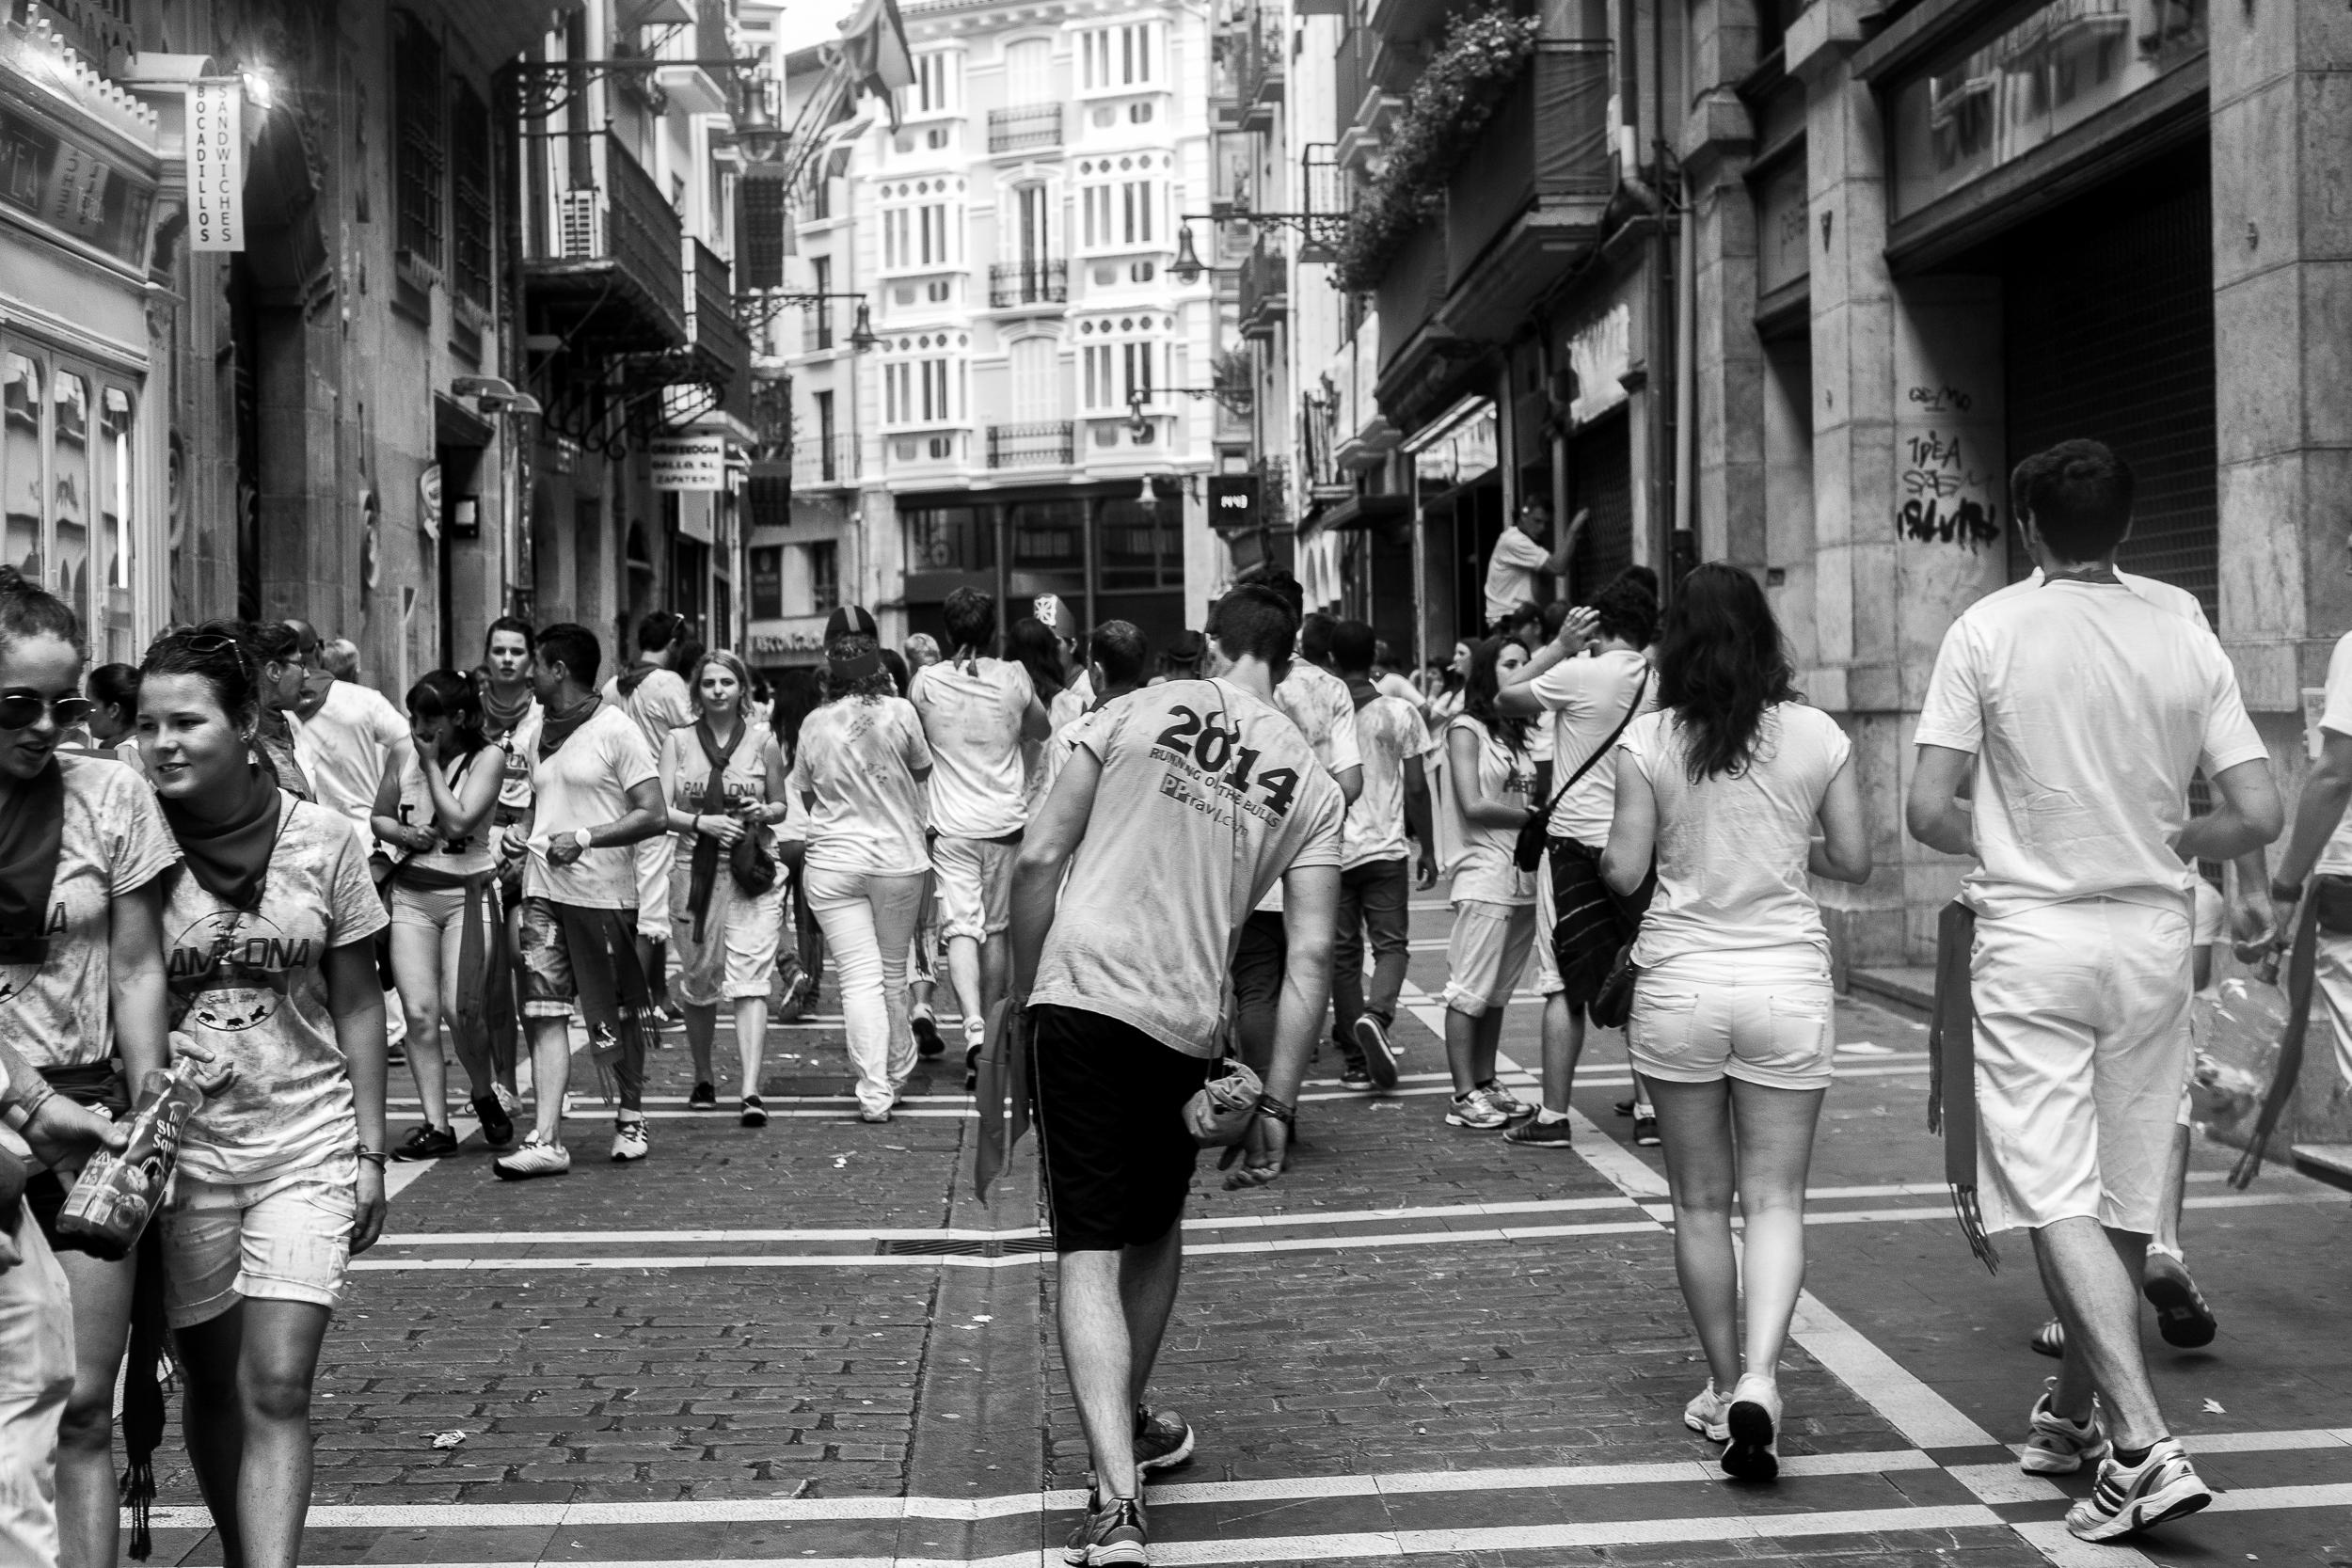 Chacon Images_Barcelona_Street_WEB_-6900.jpg